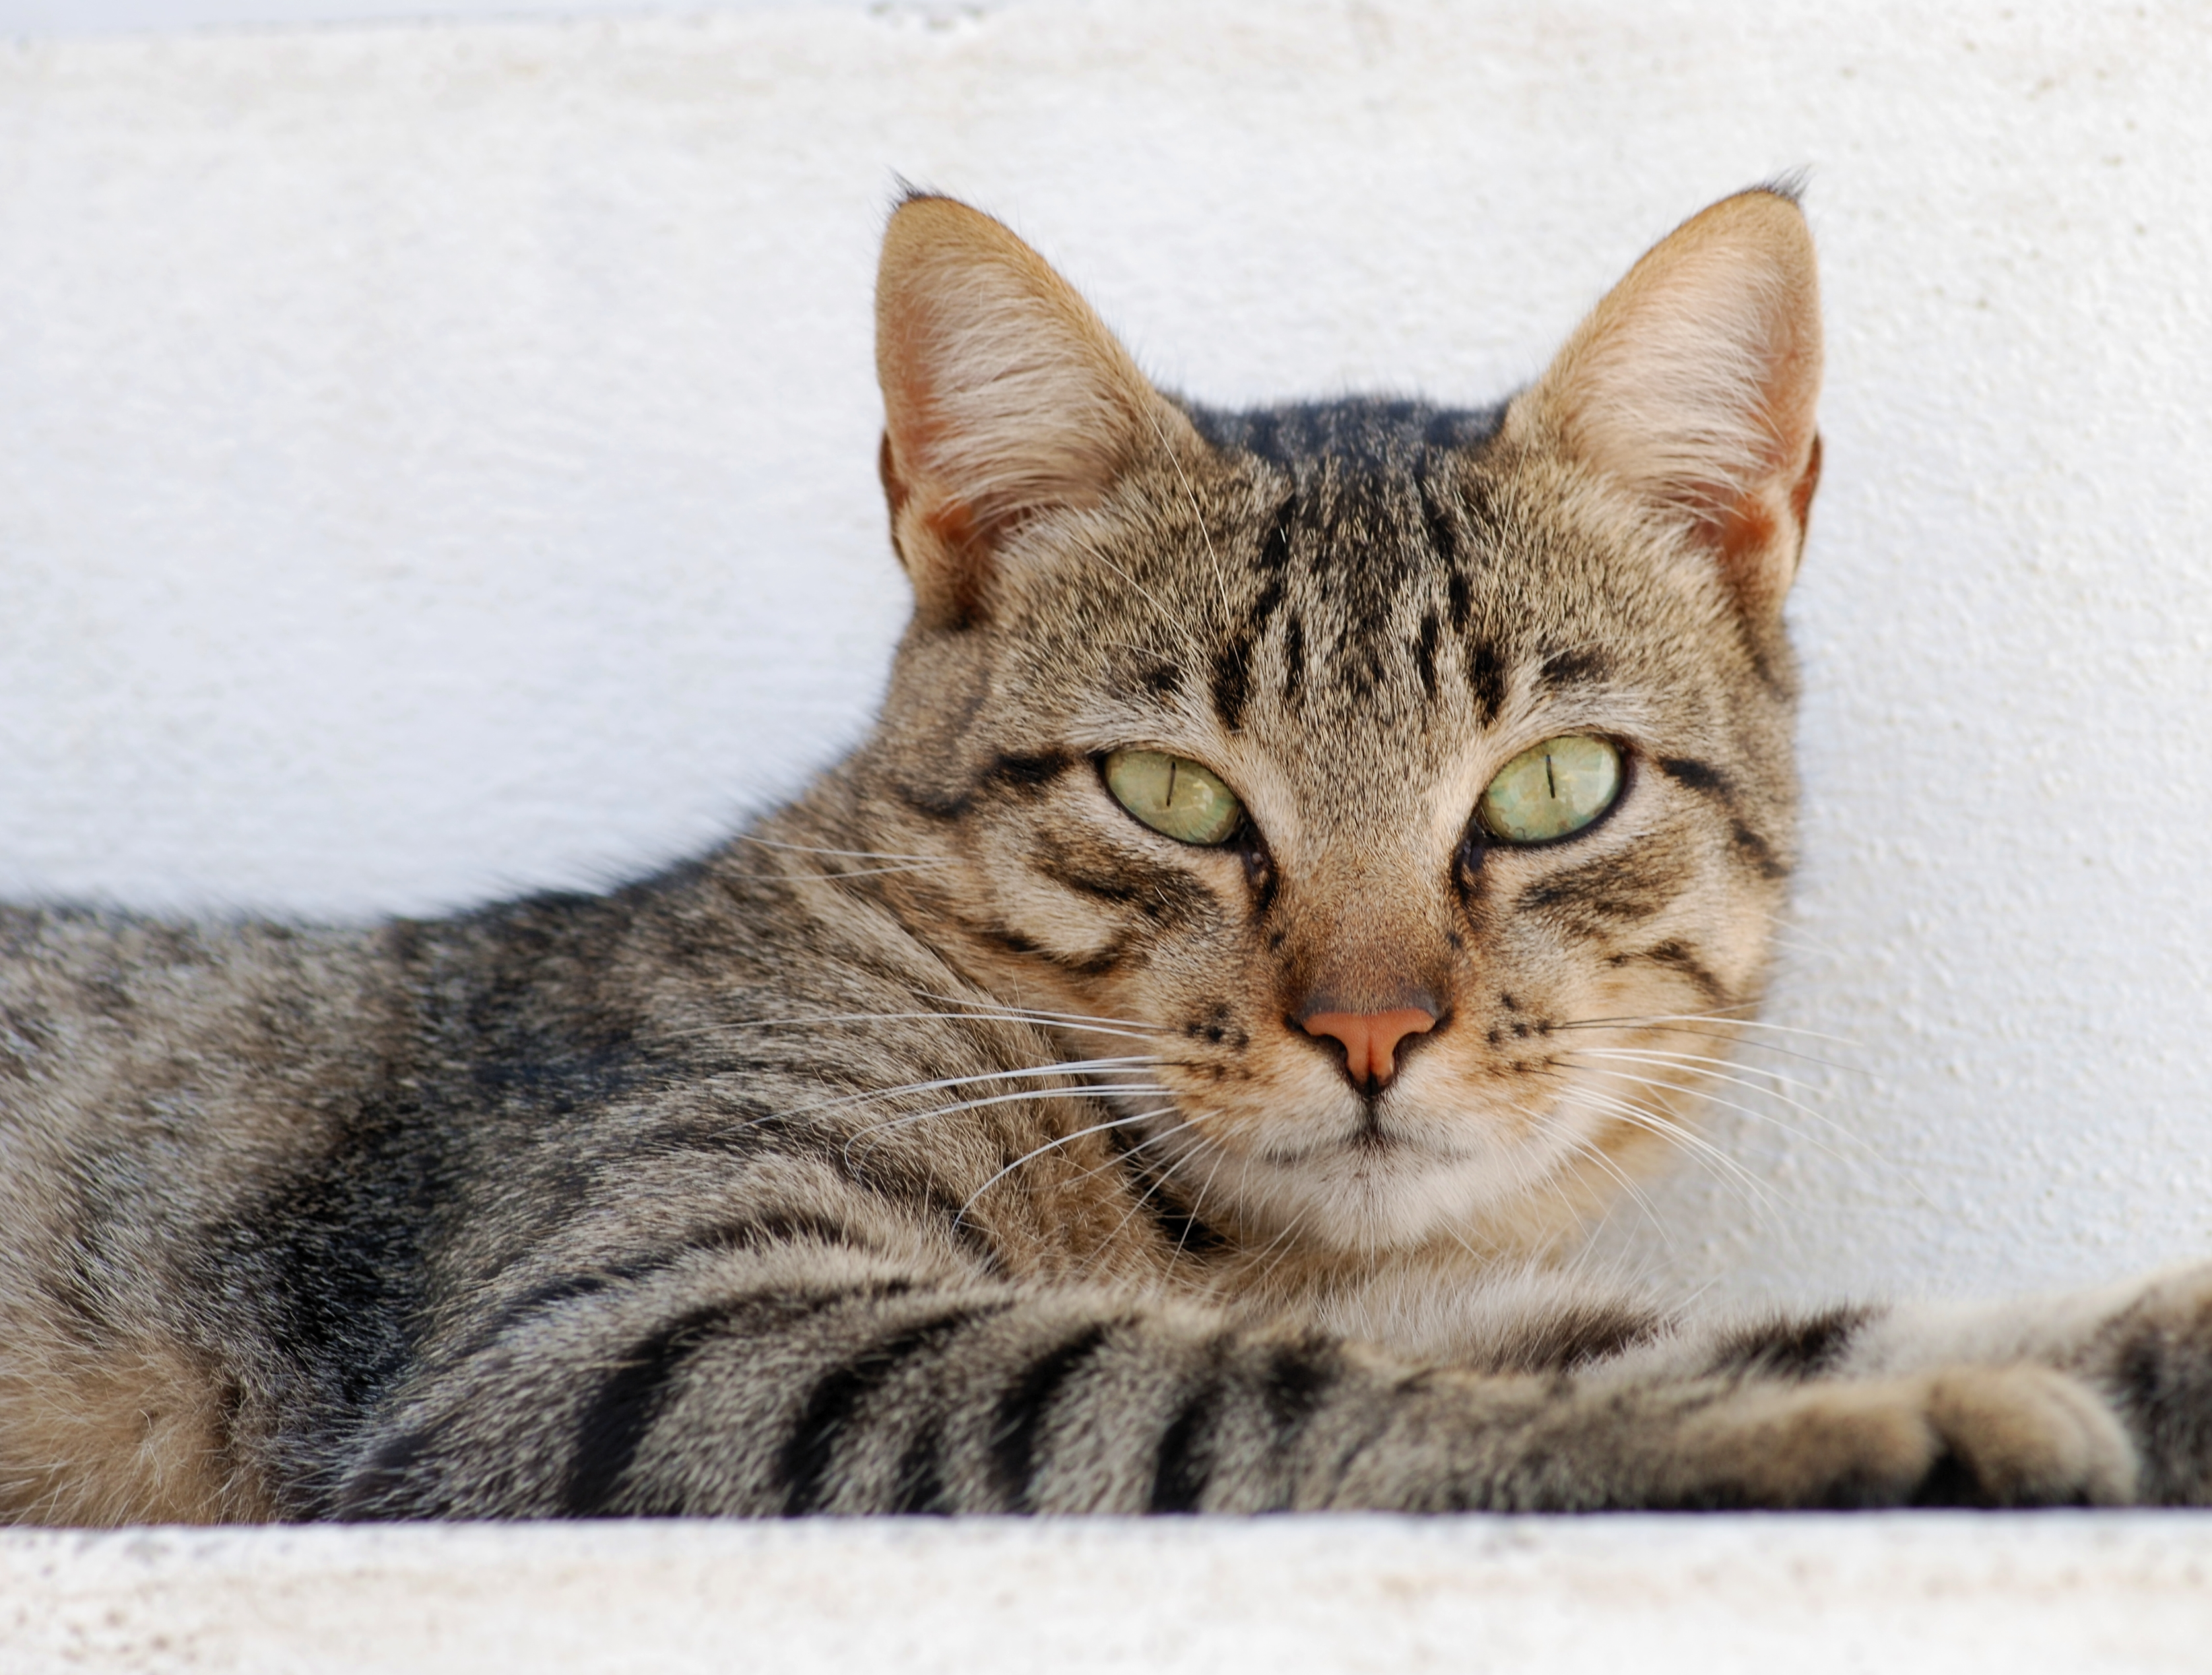 Portrait of a male tabby cat